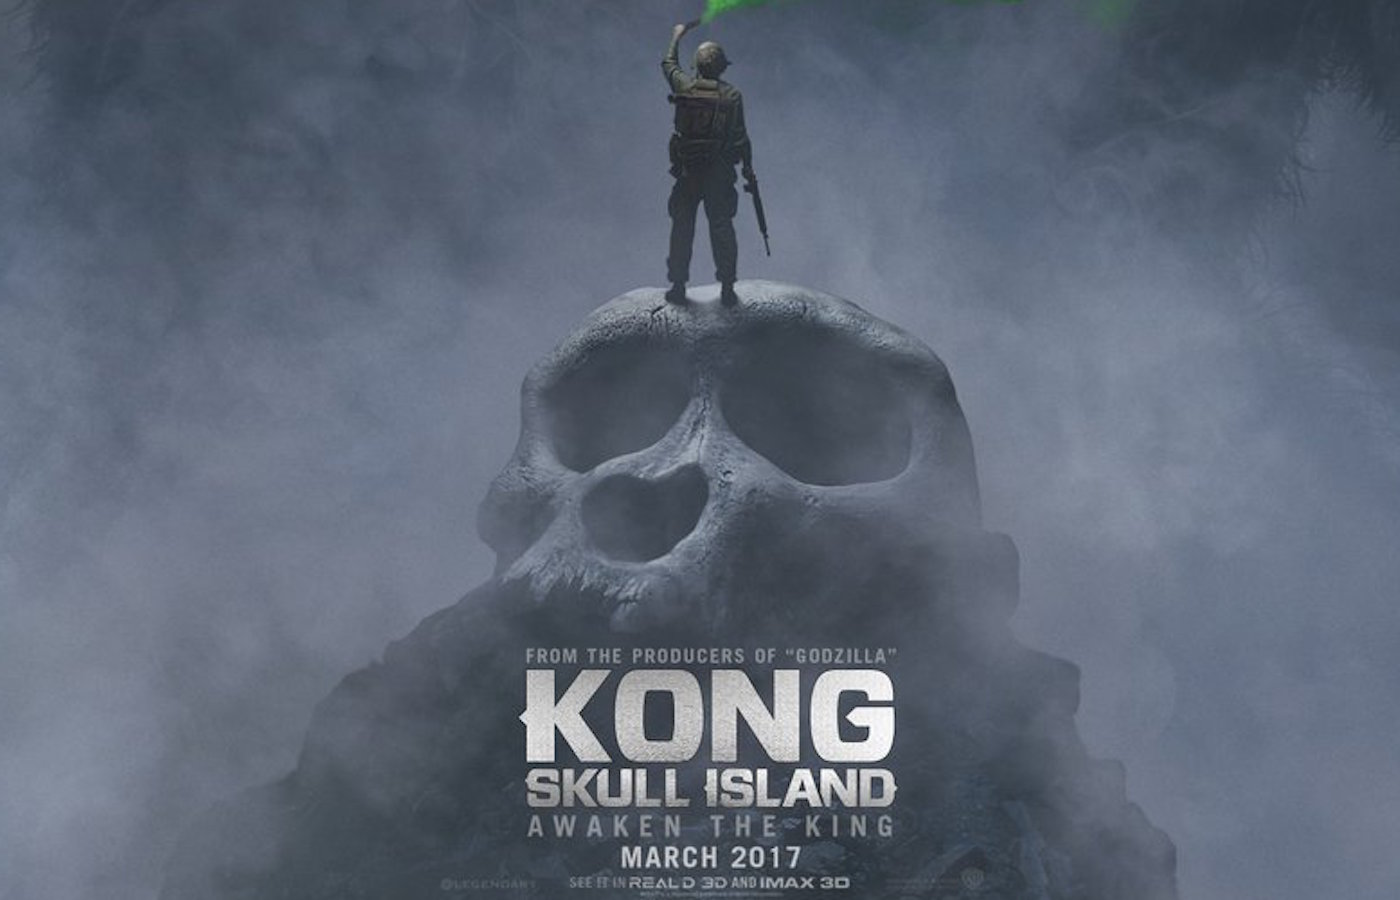 kong-skull-island-poster-2.jpg